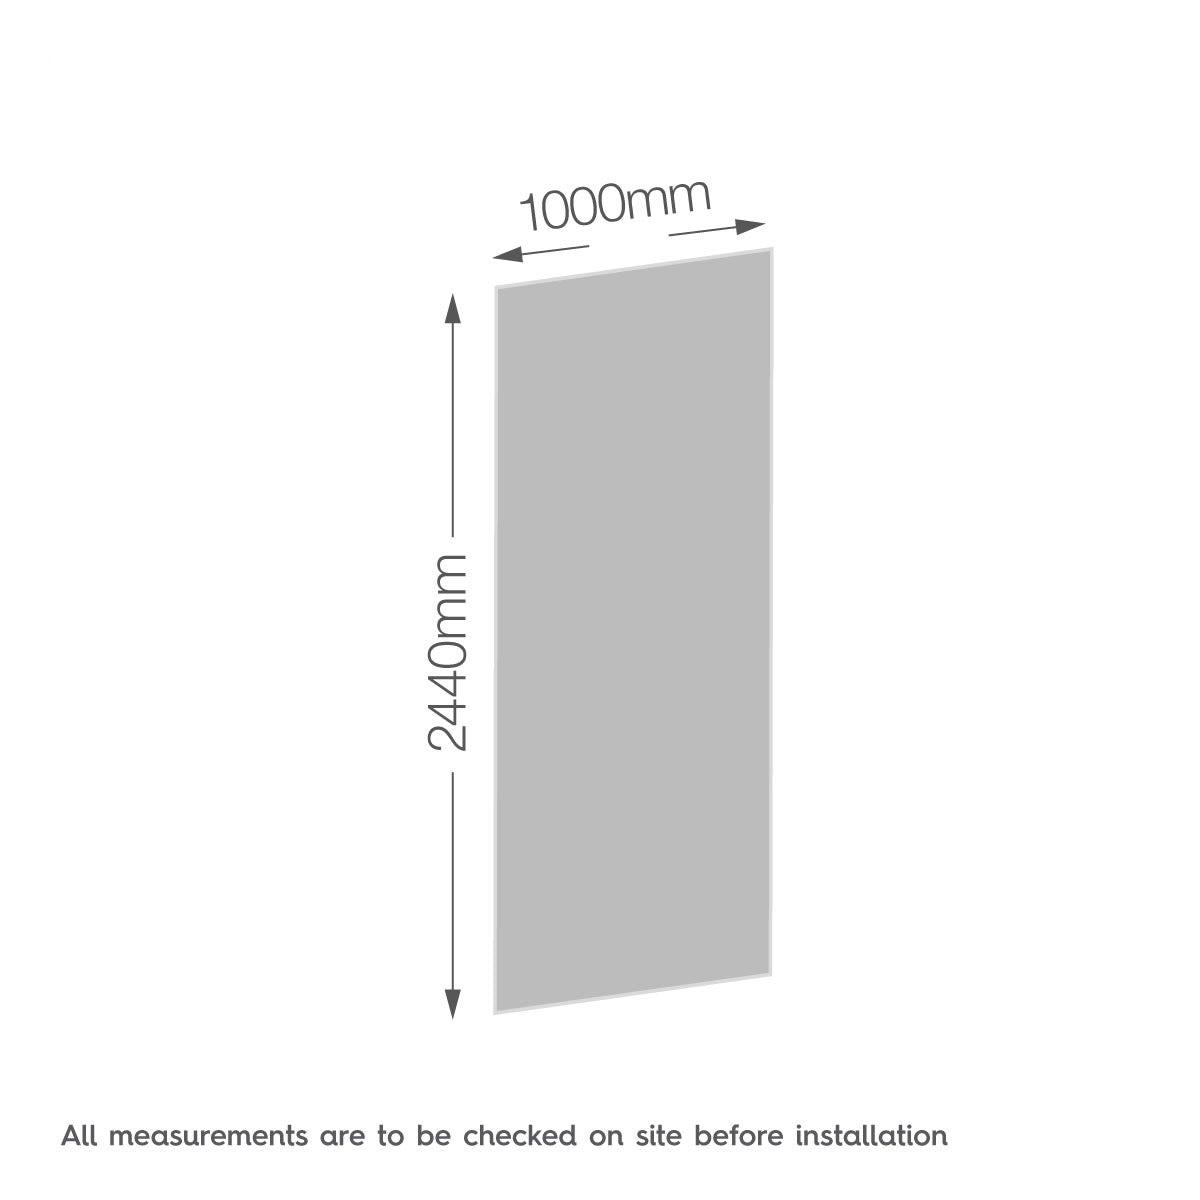 Dimensions for Zenolite plus stone acrylic shower wall panel 2440 x 1000